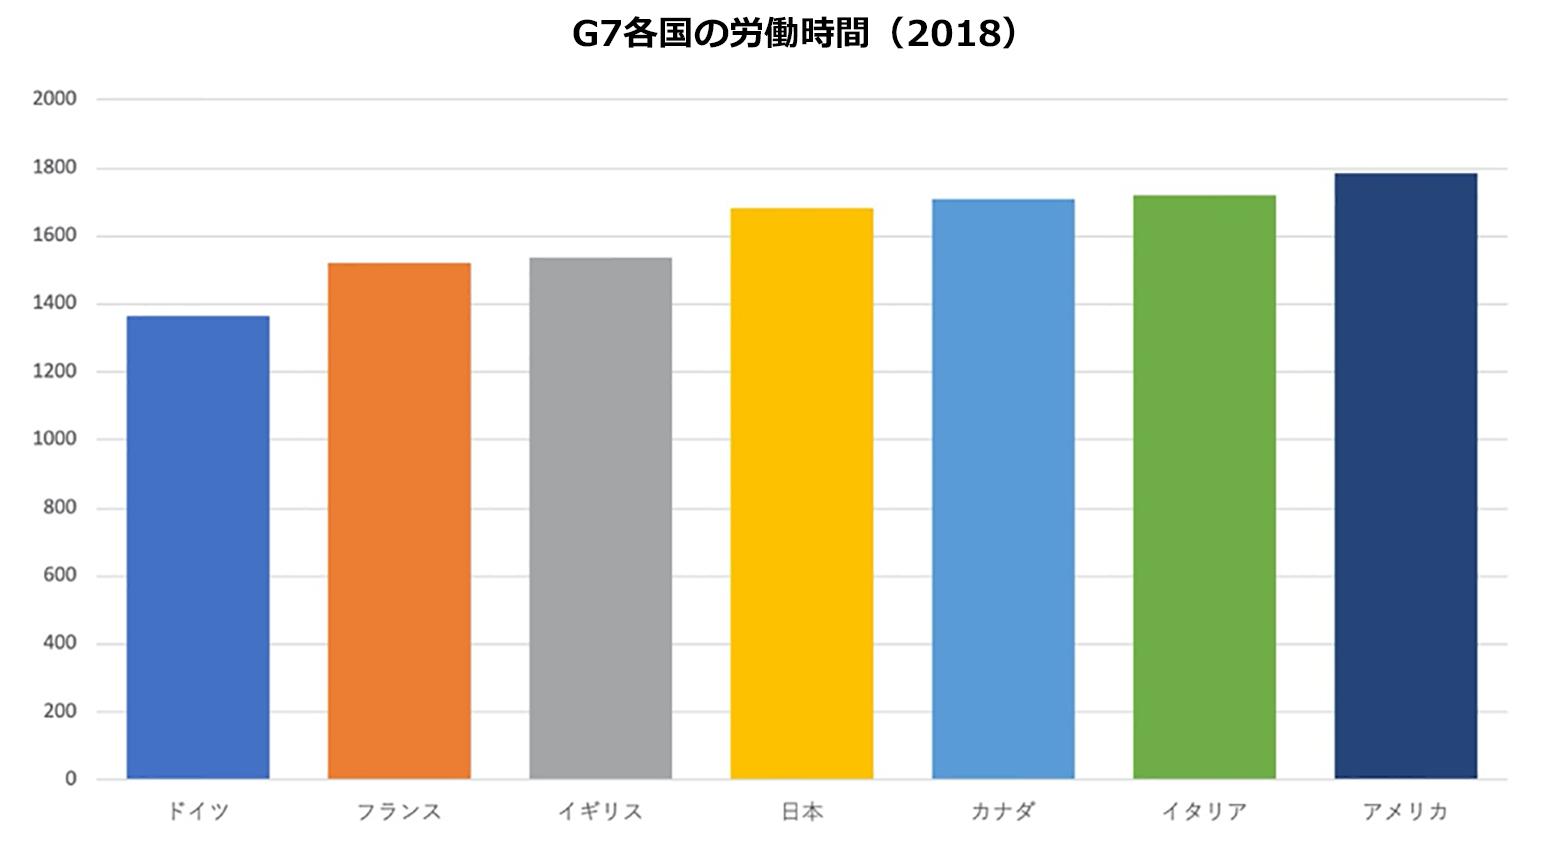 G7各国の労働時間(2018)